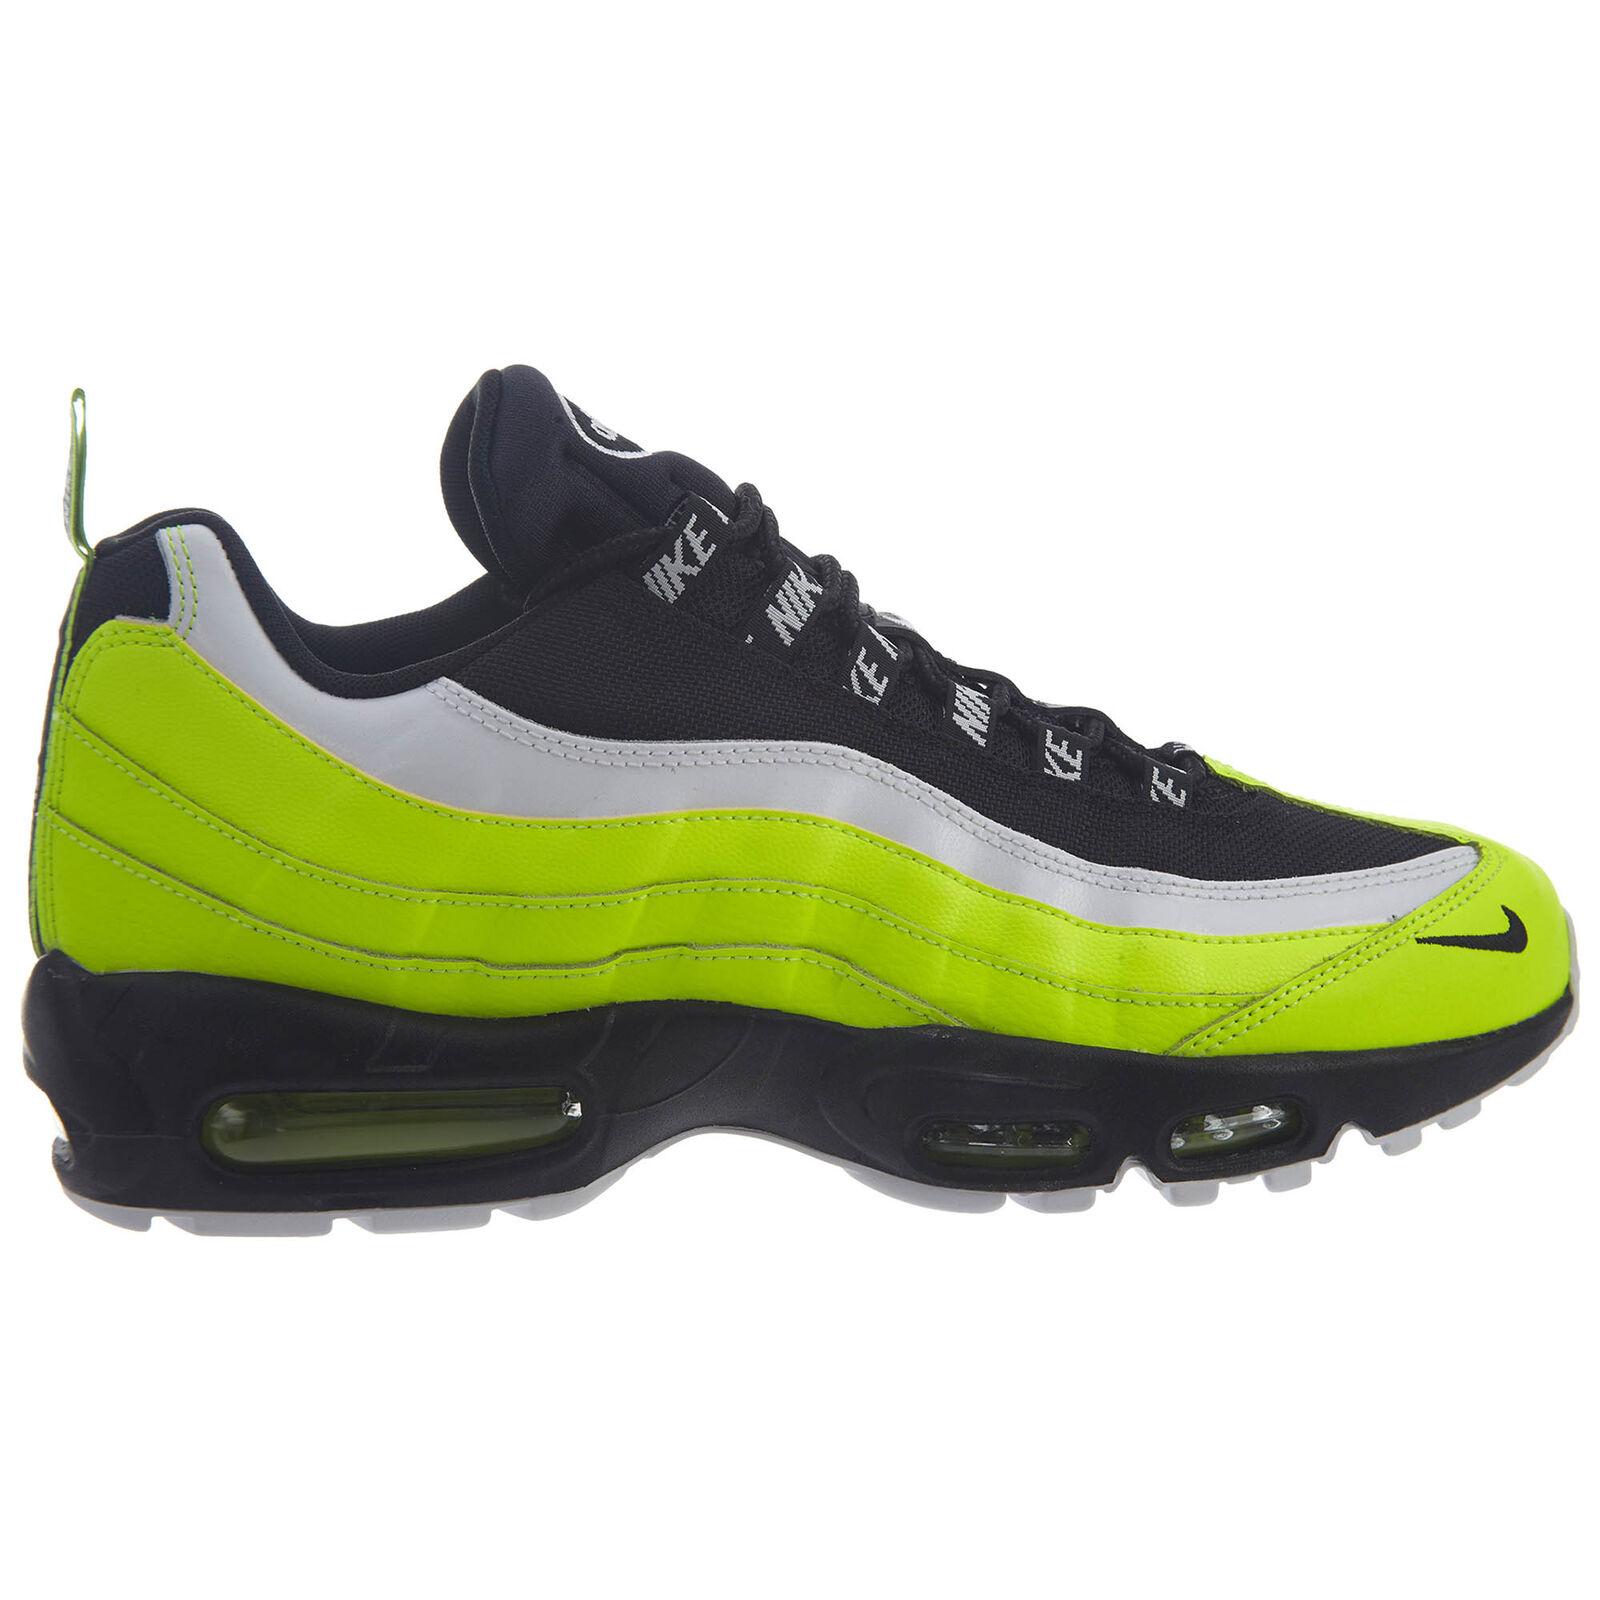 Nike Air Max 95 Premium Mens 538416-701 Volt Glow Black Running shoes Size 10